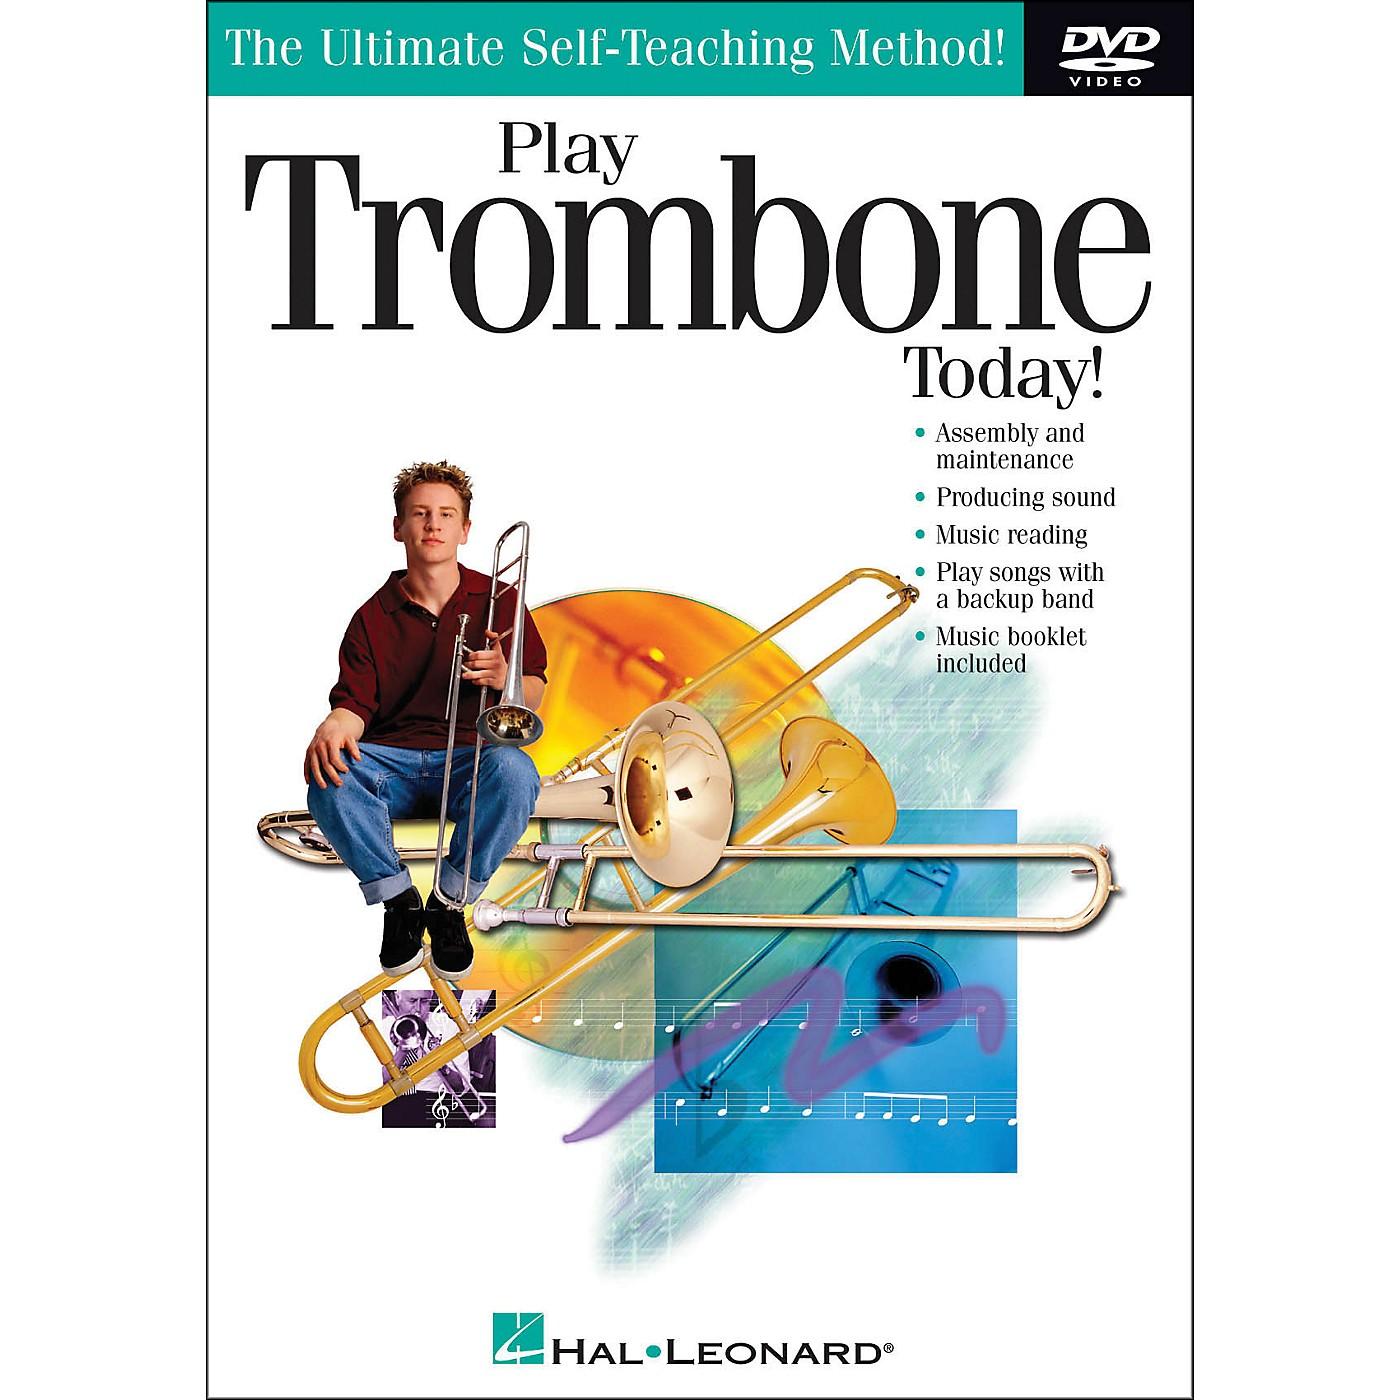 Hal Leonard Play Trombone Today! DVD thumbnail